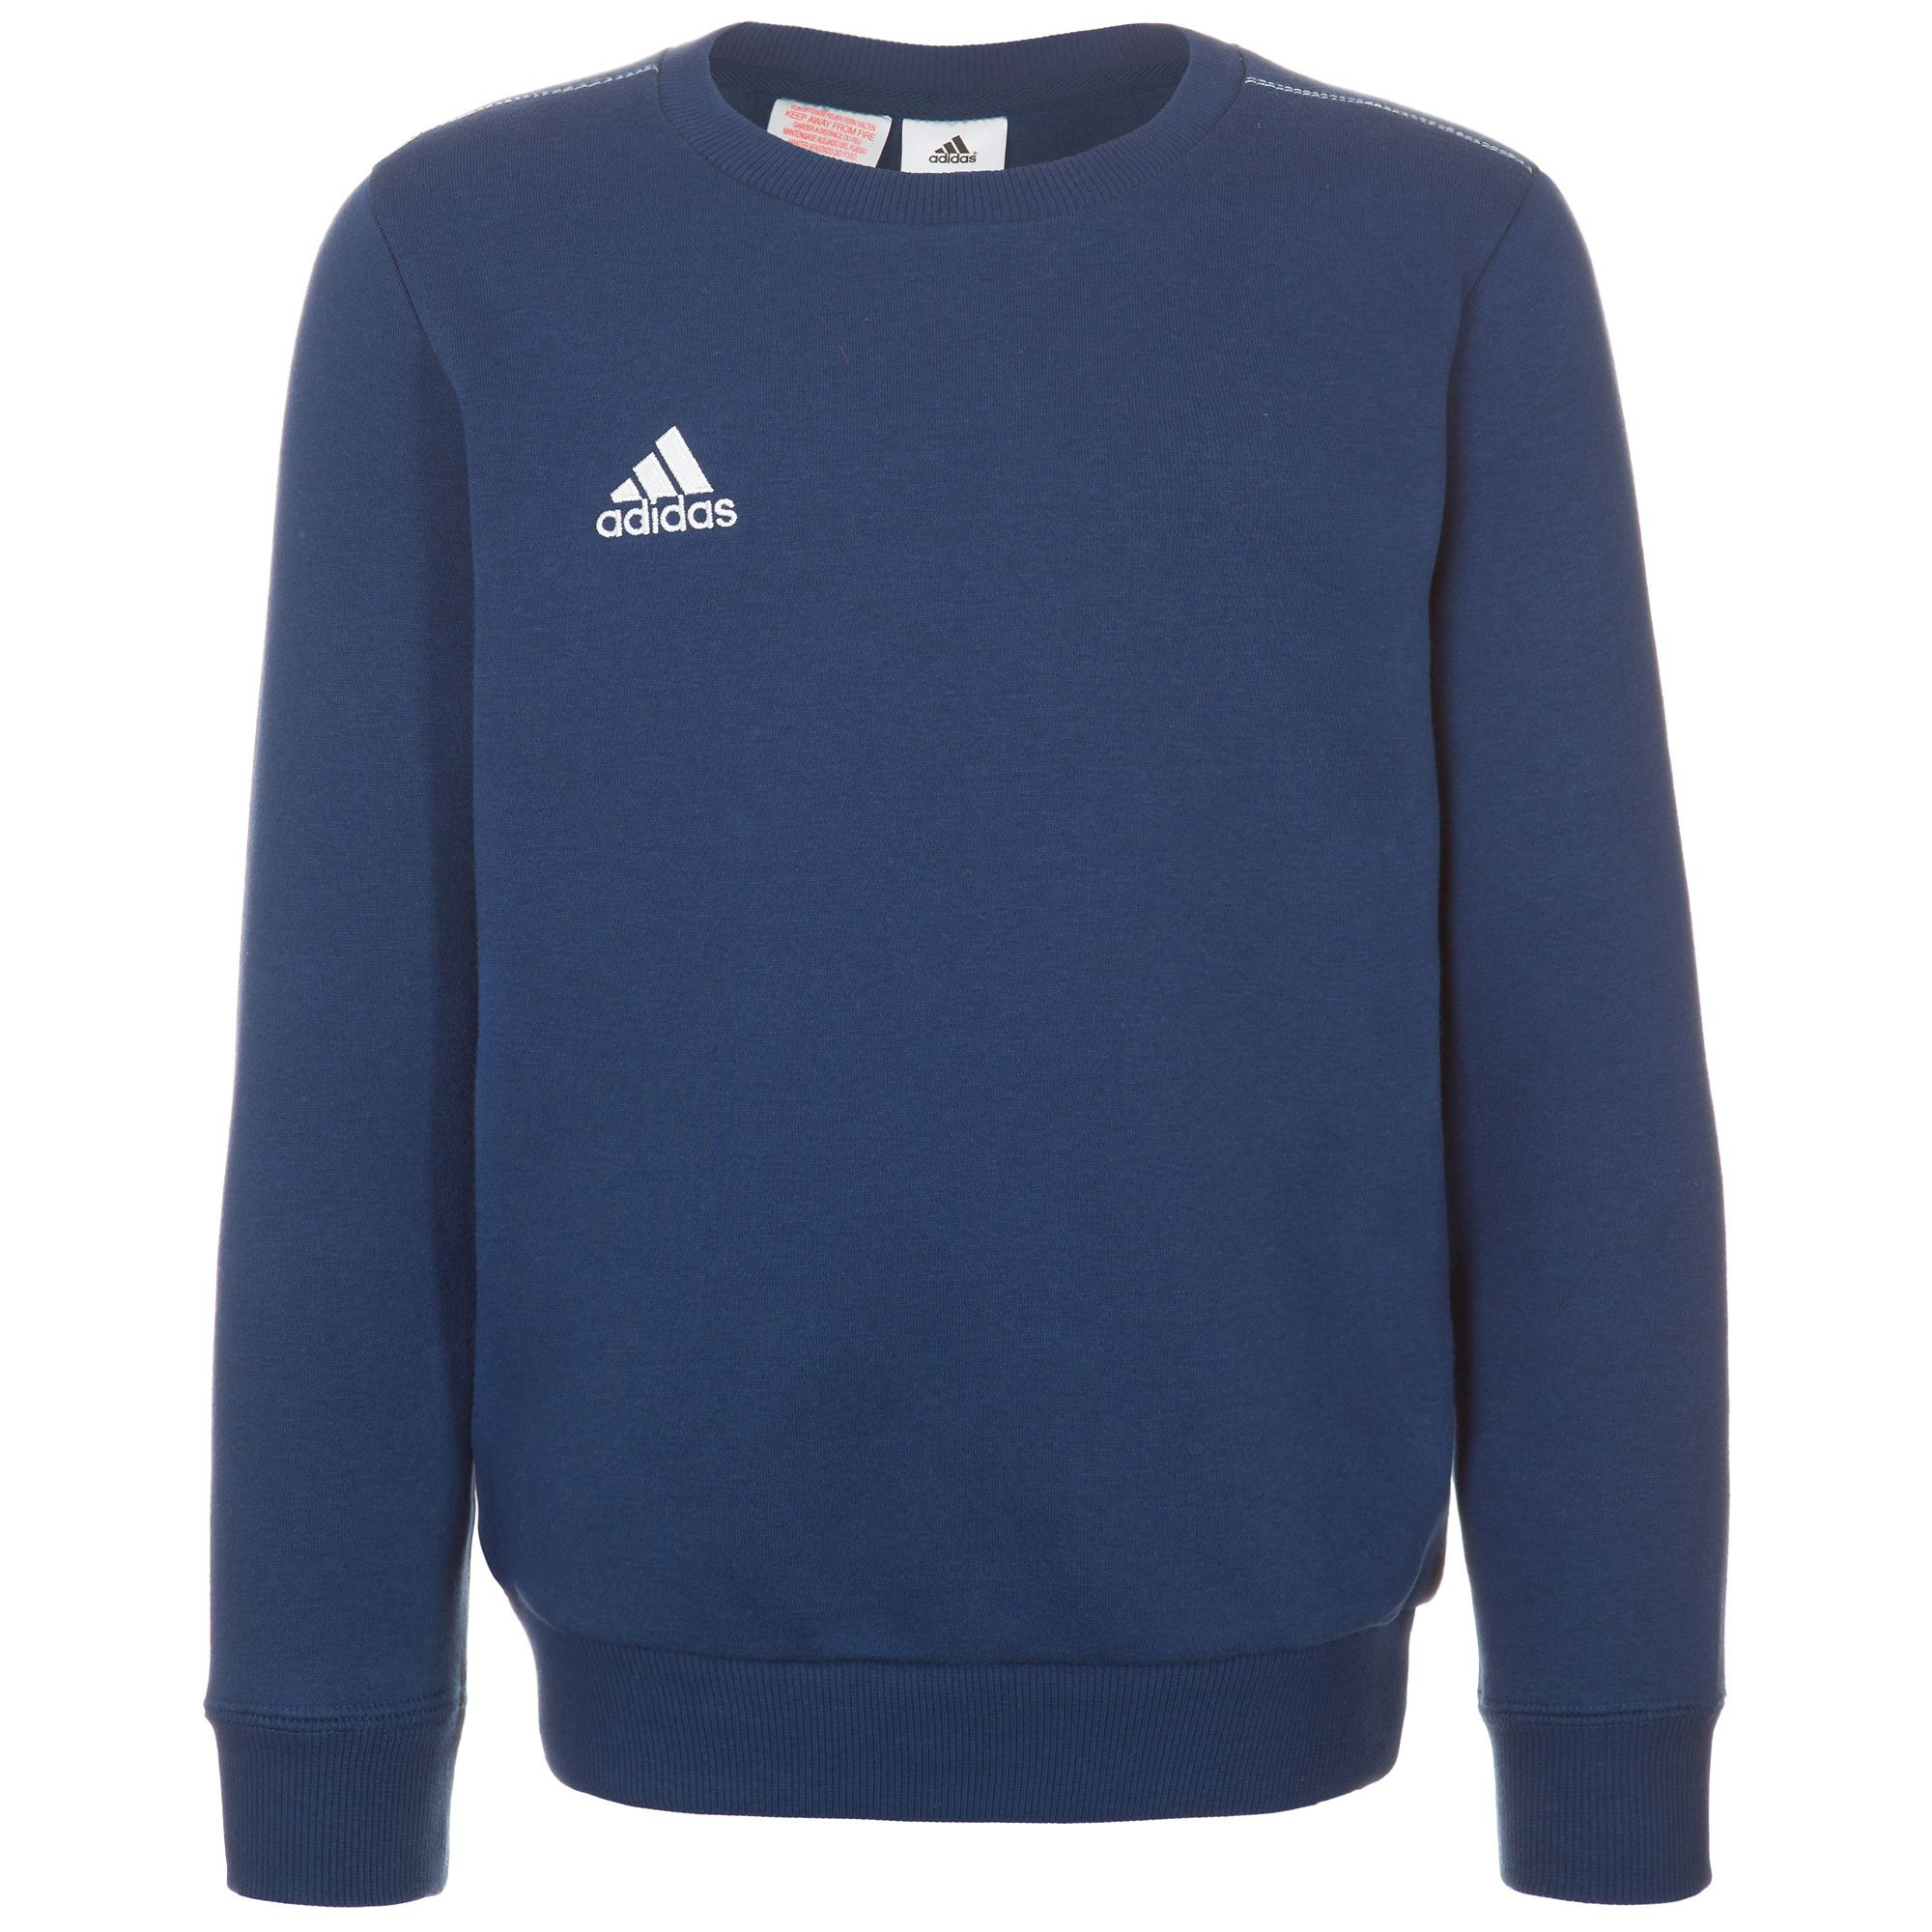 ADIDAS PERFORMANCE adidas Performance Core 15 Sweatshirt Kinder